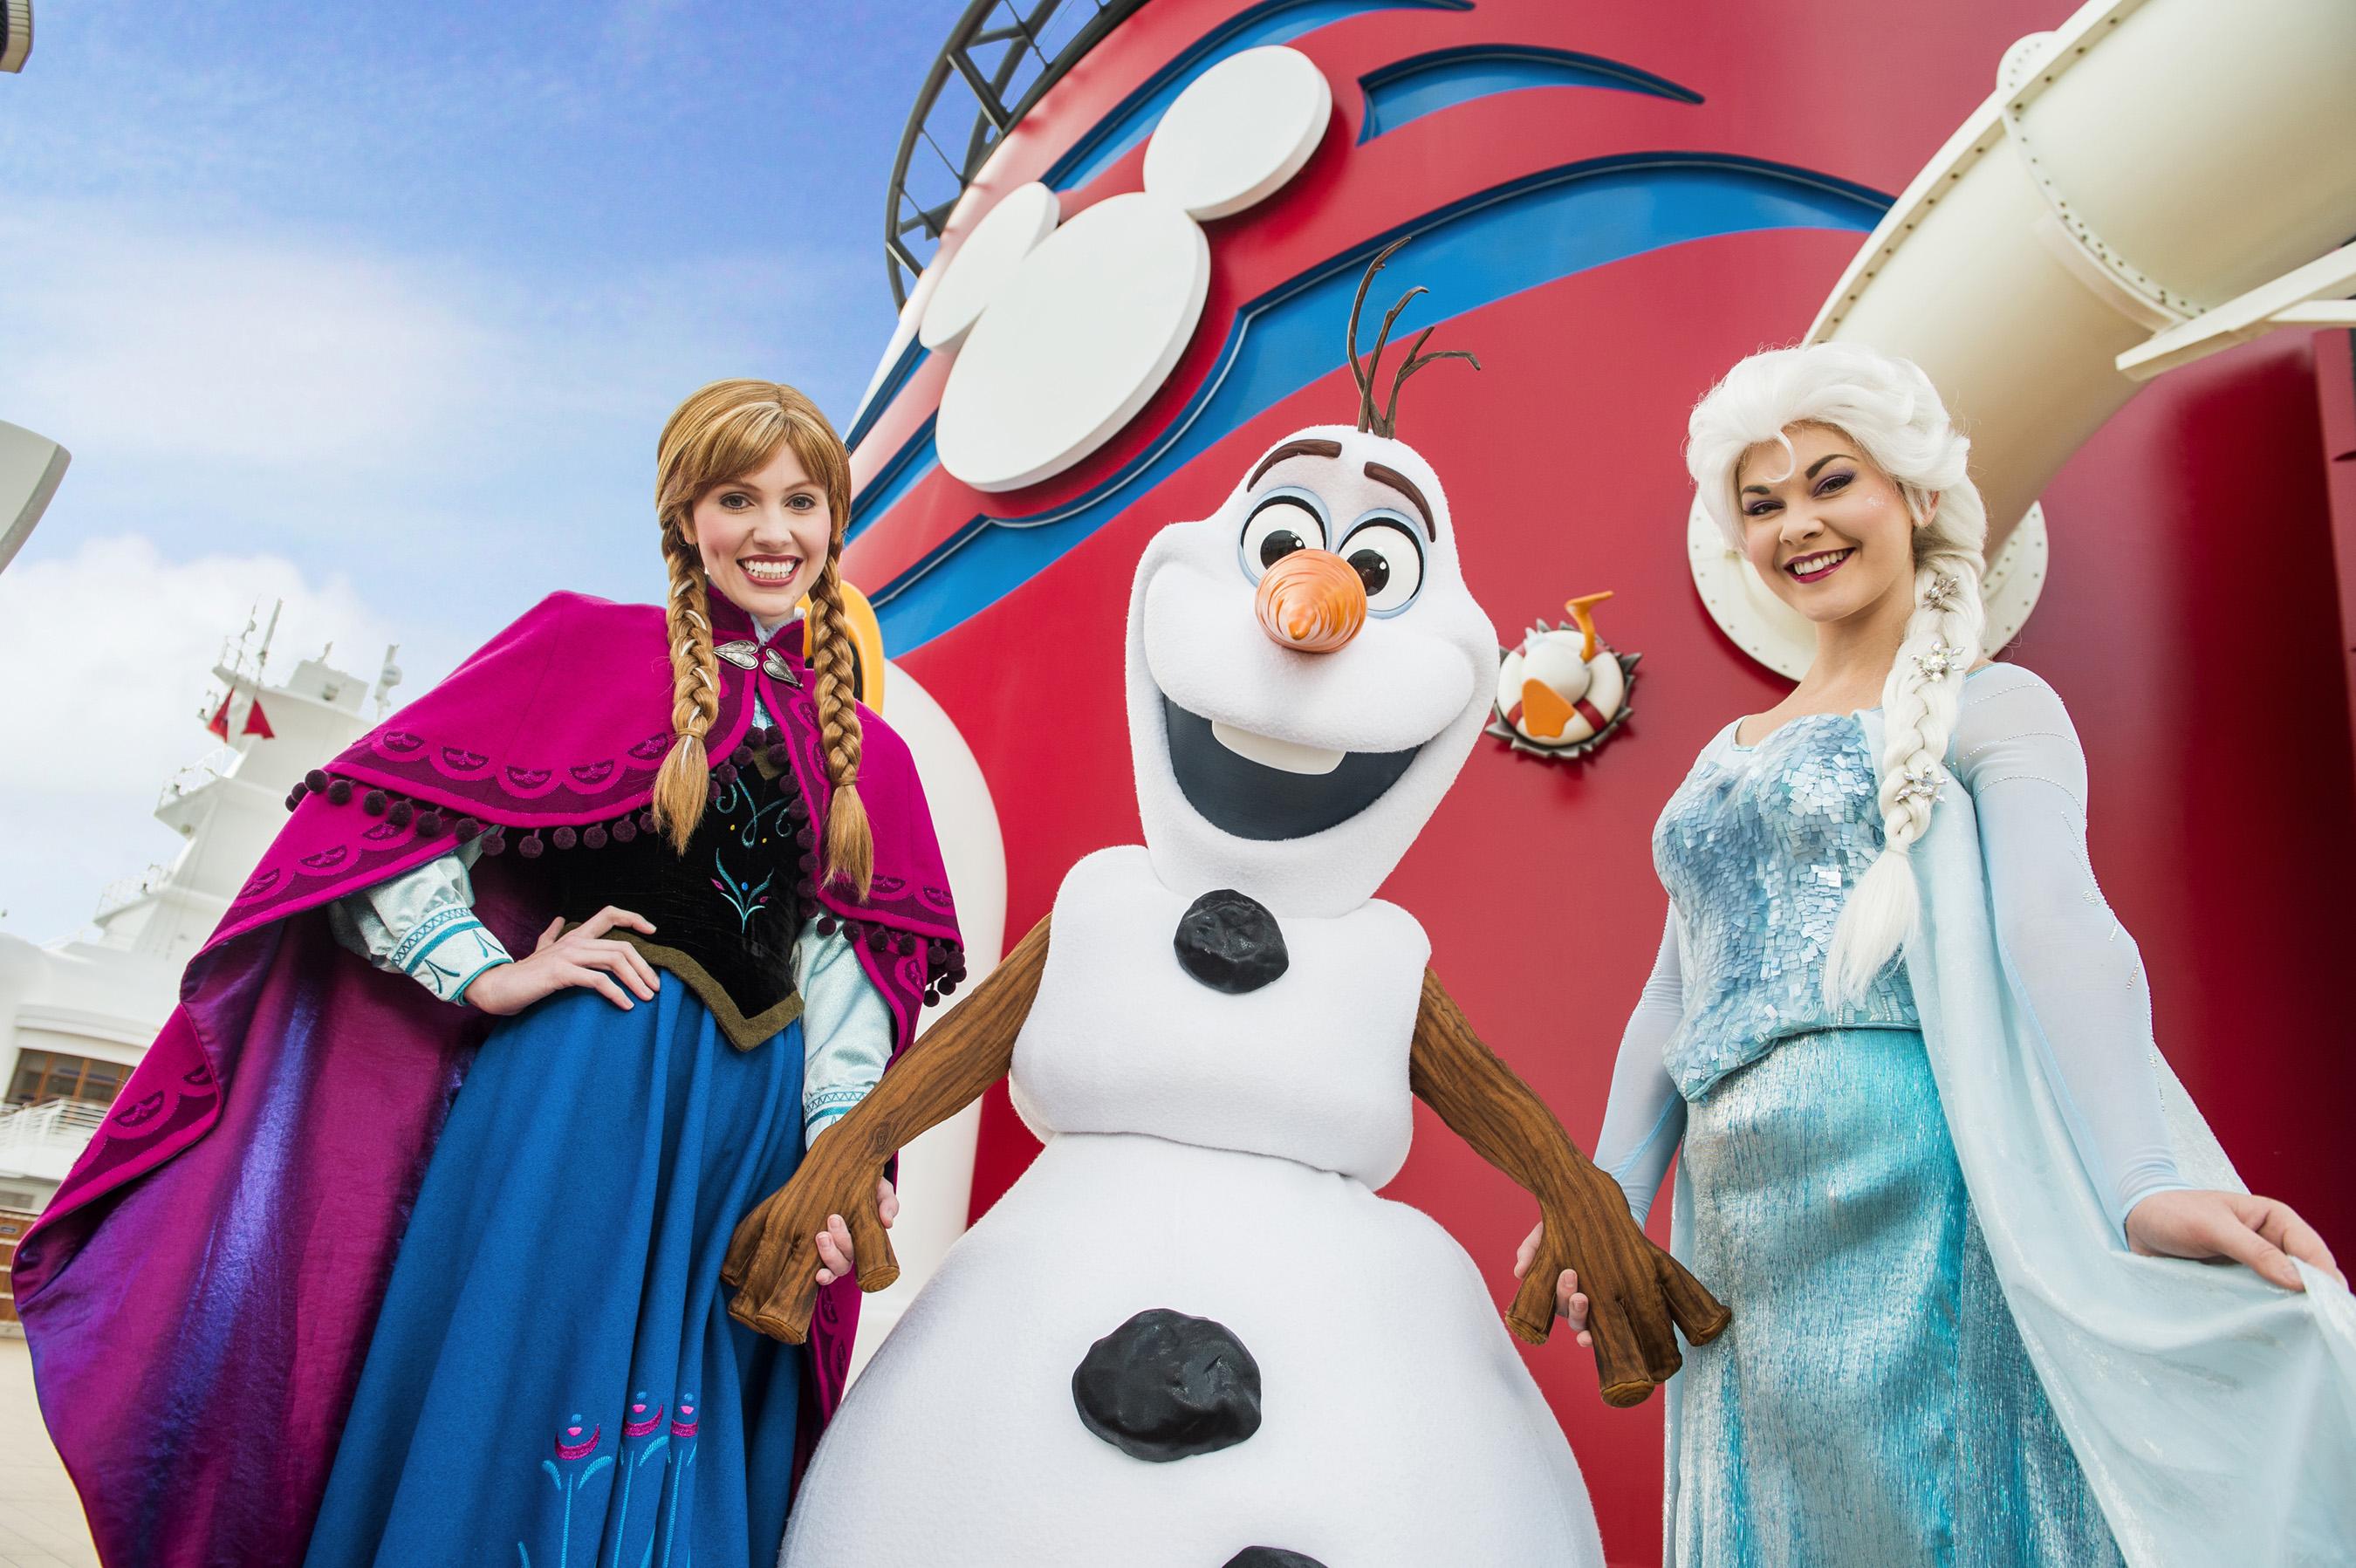 Land of Frozen en los Cruceros de Disney - Anna, Elsa and Olaf